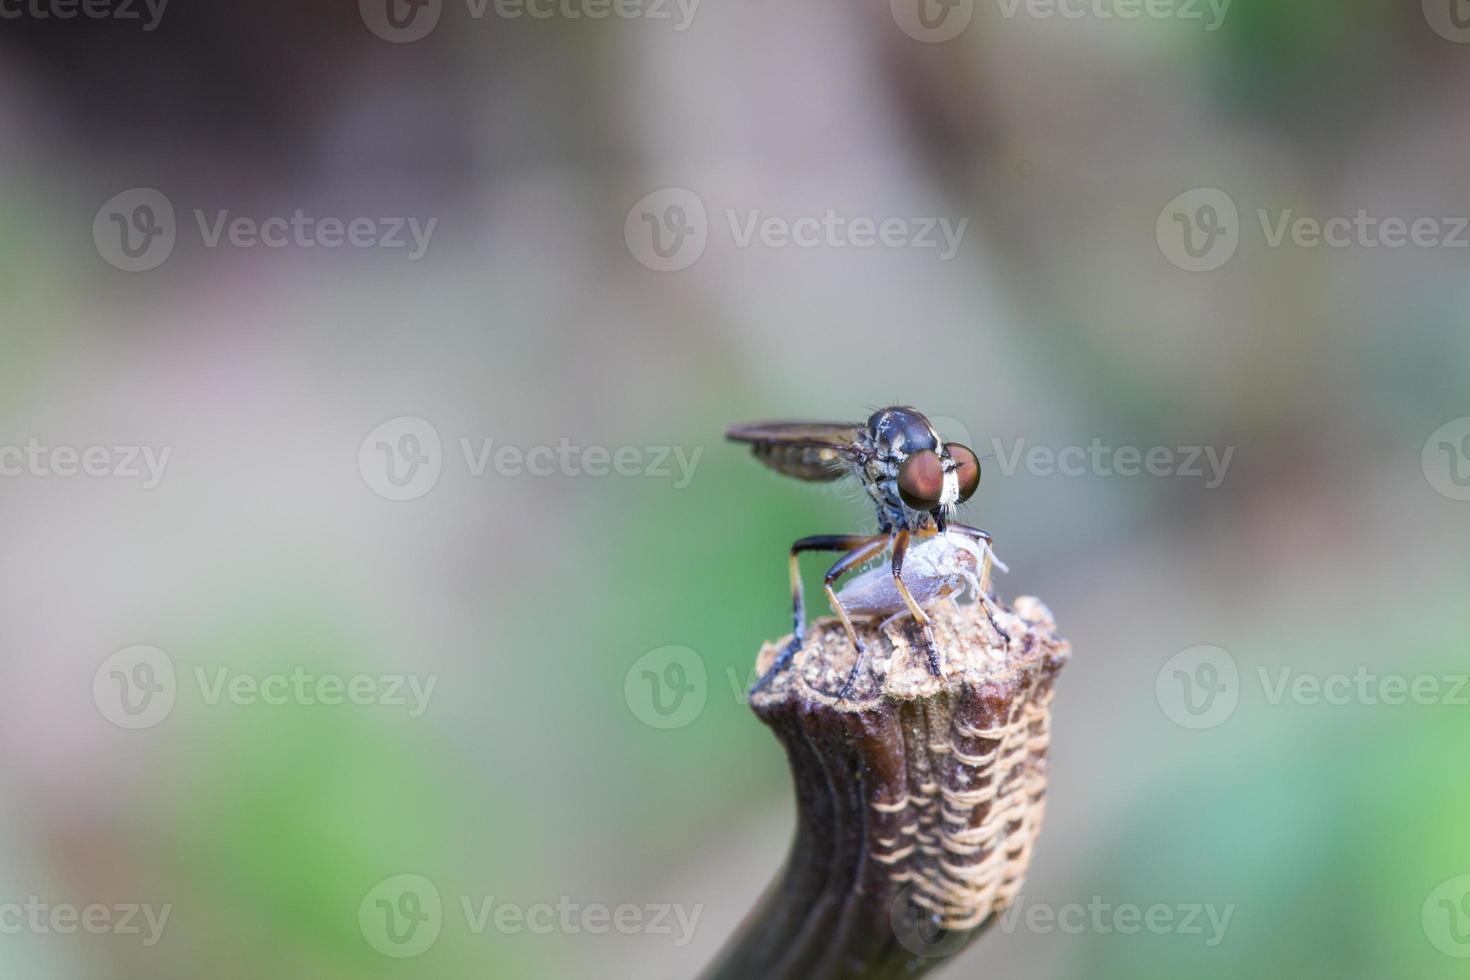 insecto comiendo otro insecto foto